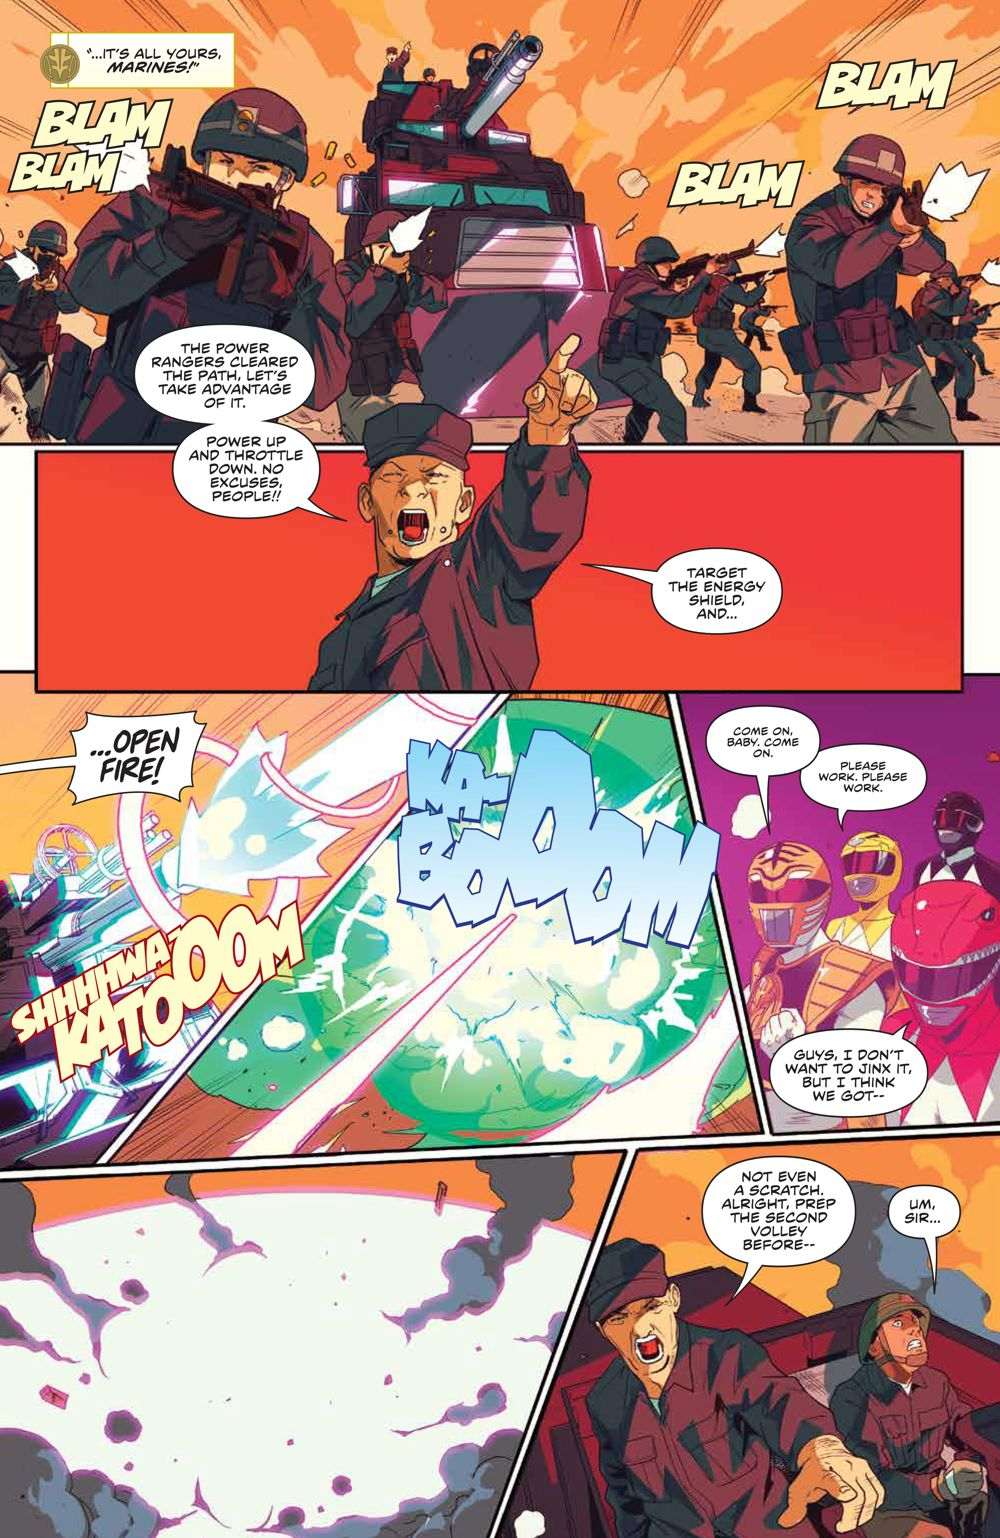 MightyMorphin_006_PRESS_8 ComicList Previews: MIGHTY MORPHIN #6